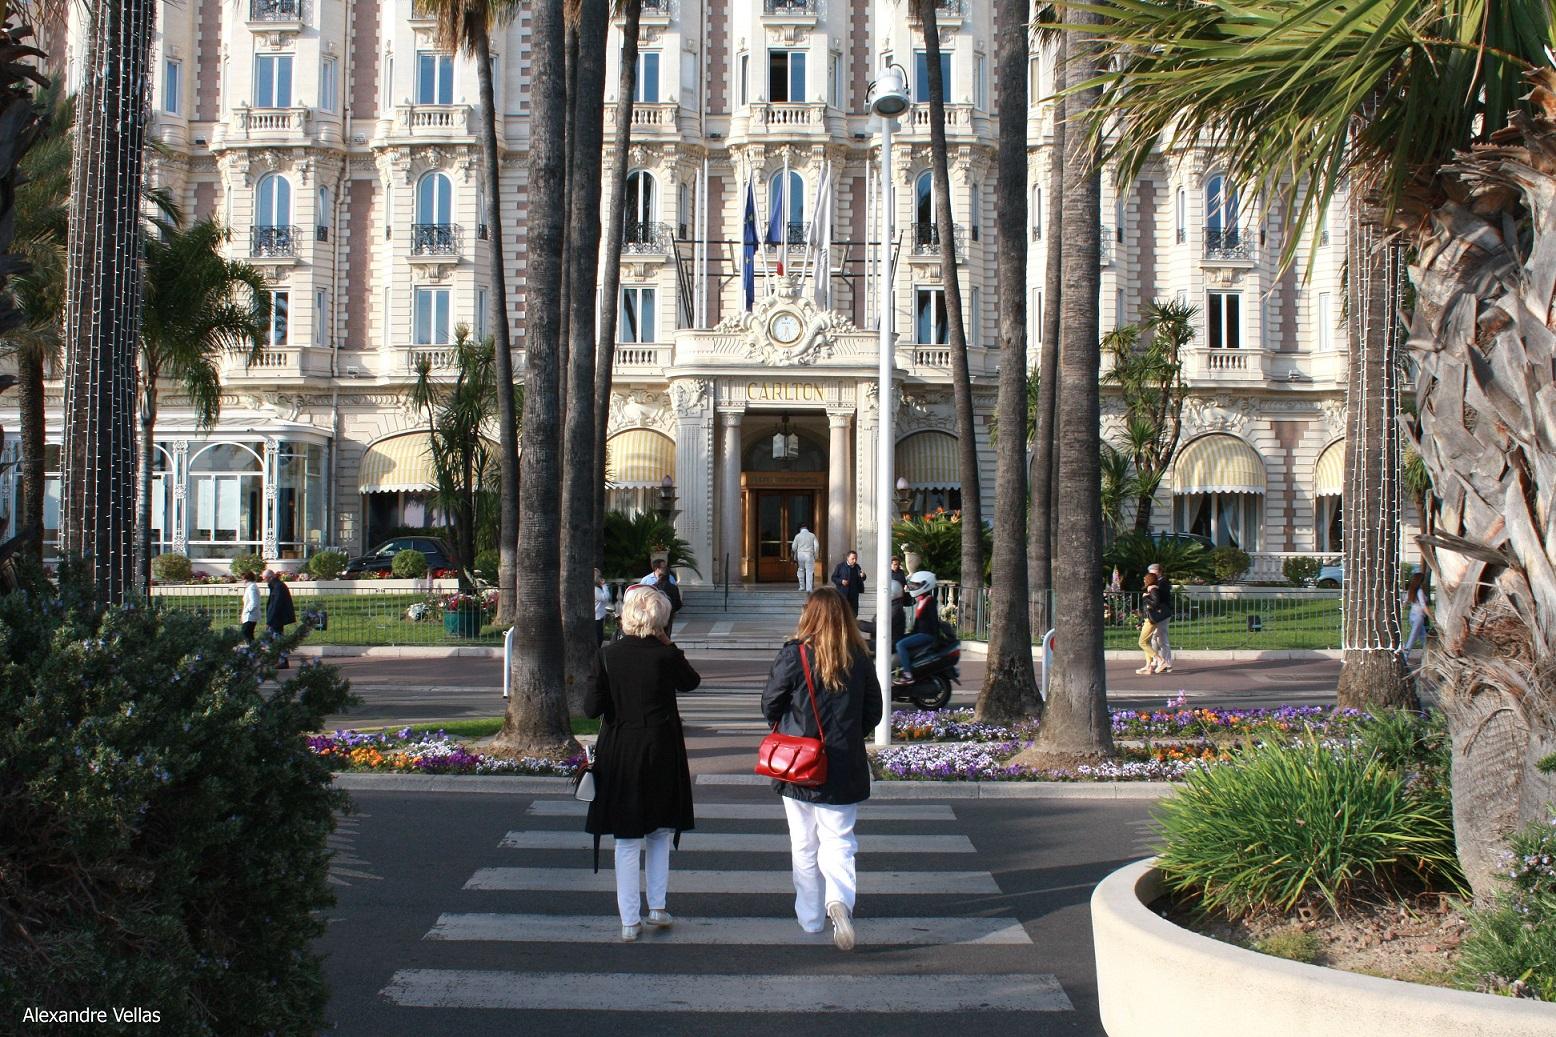 Stile e Moda a Cannes Carlton Hotel